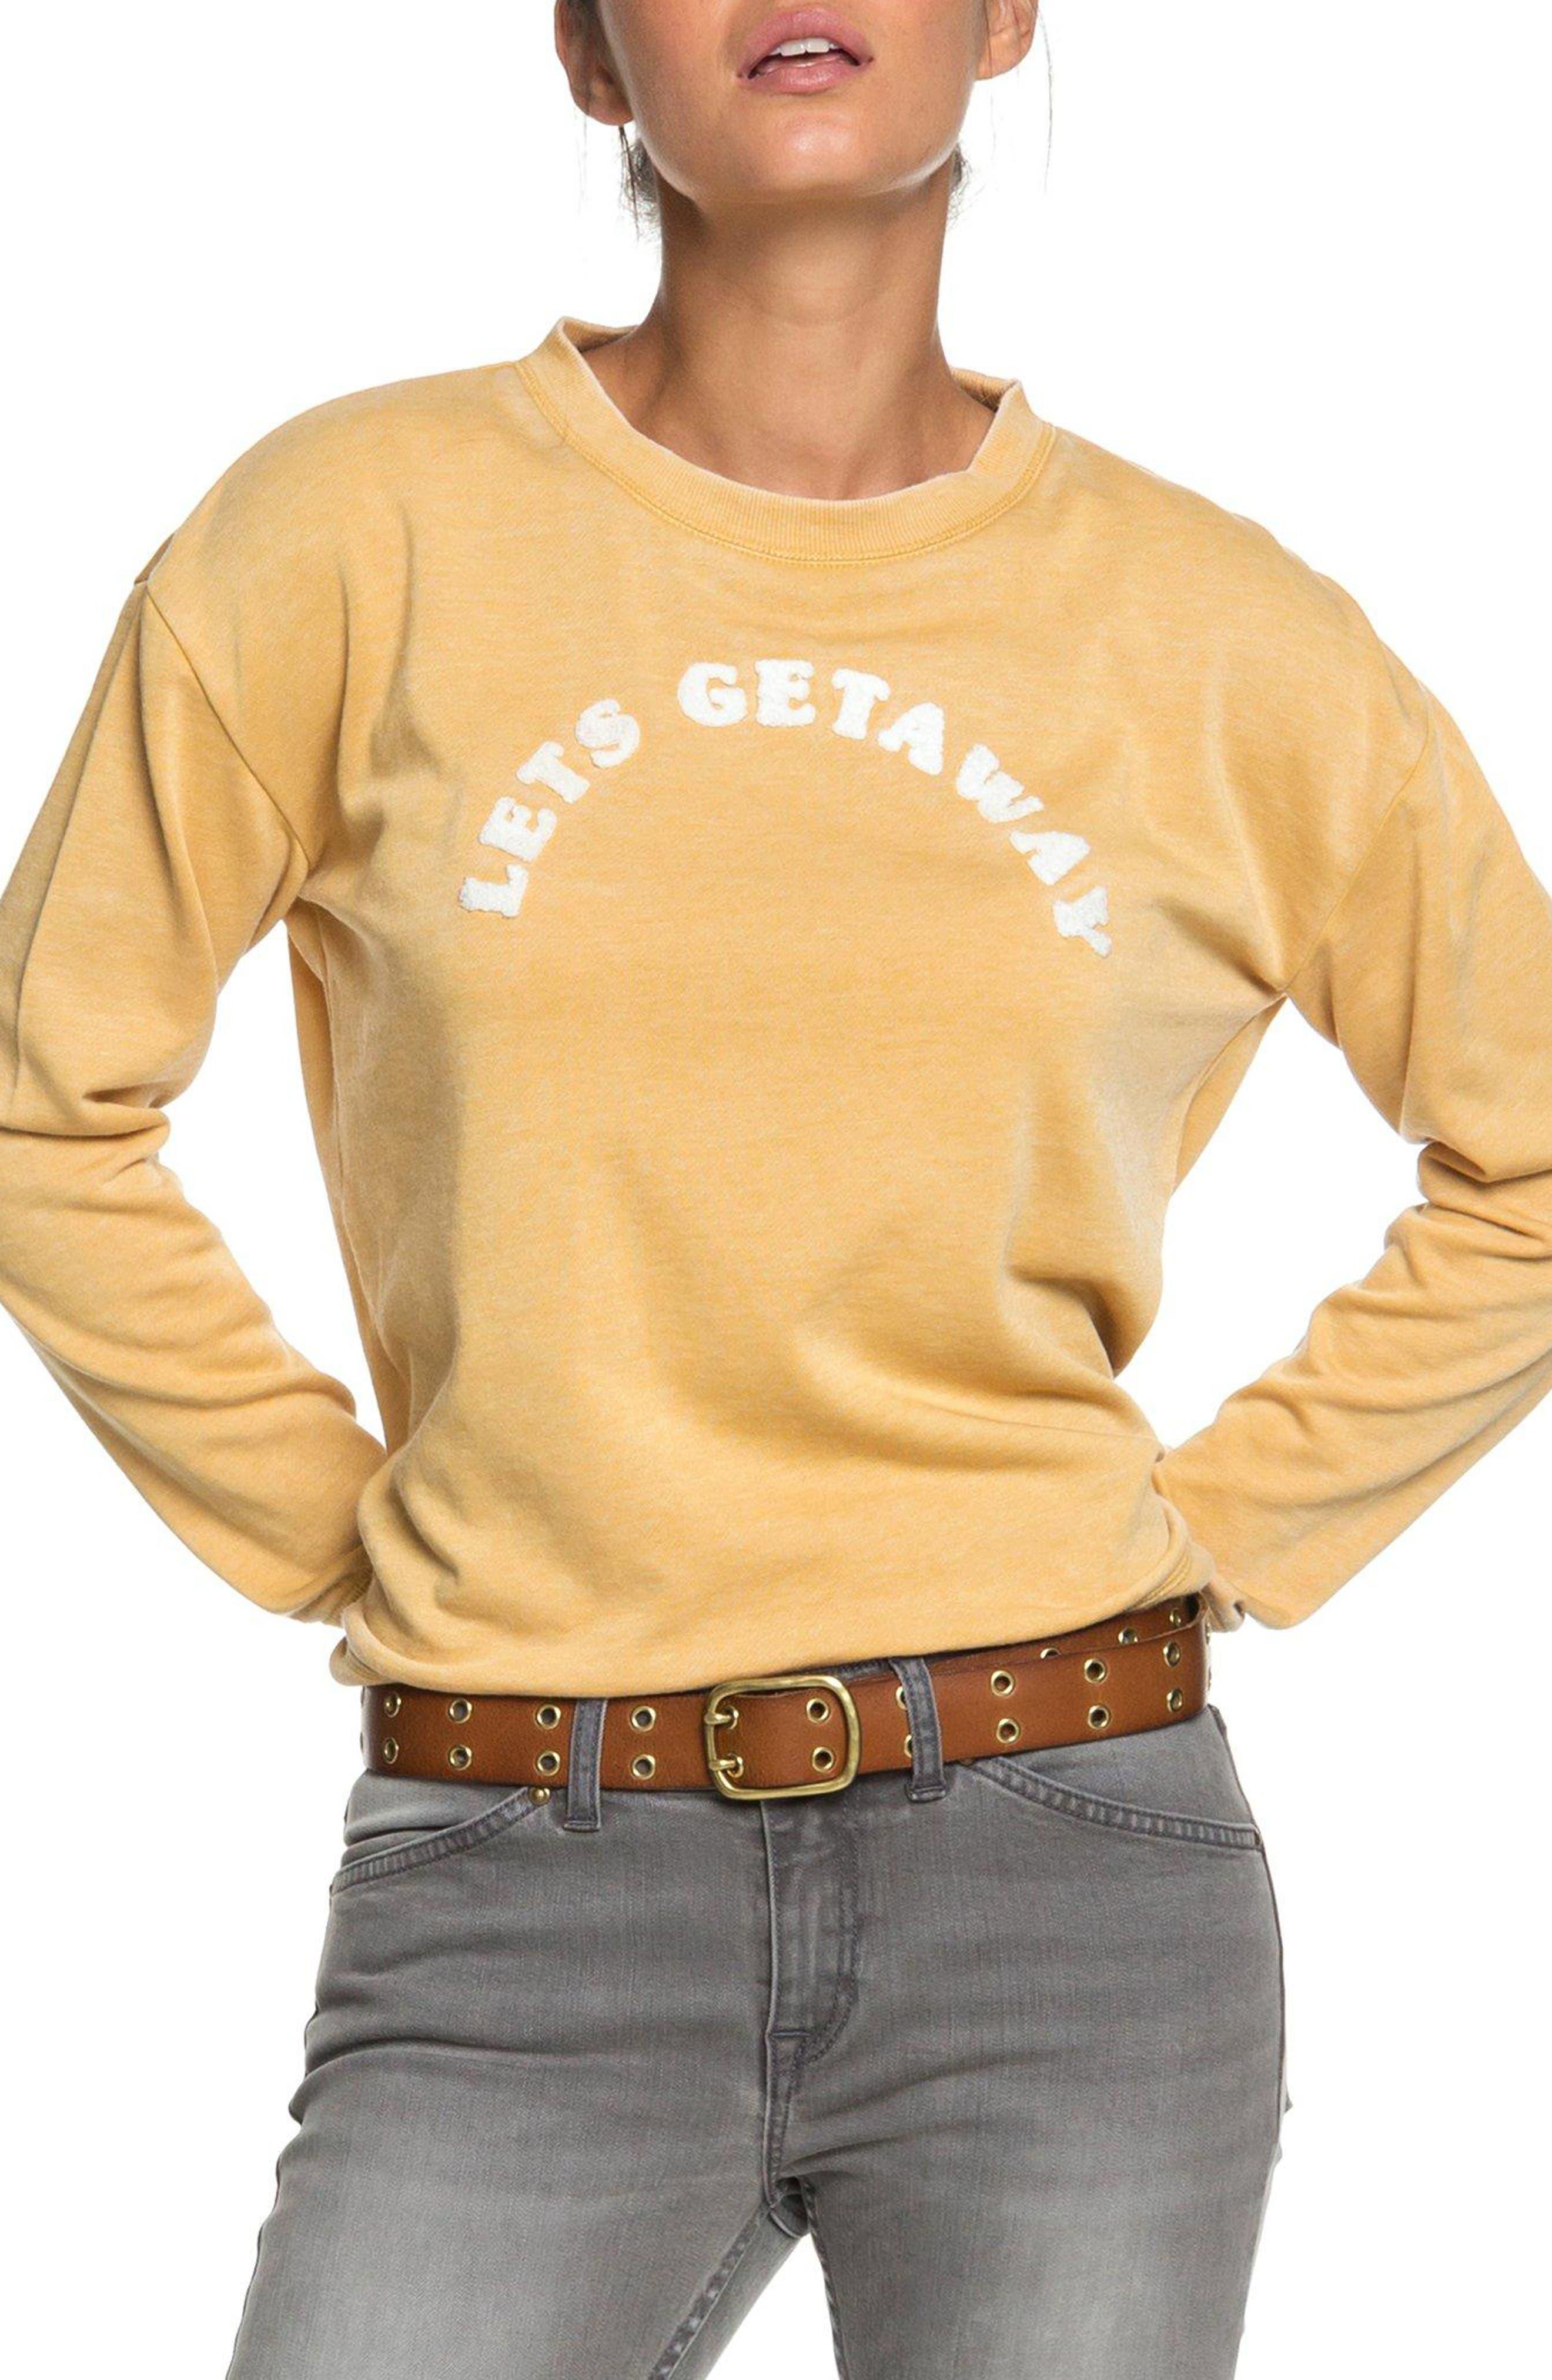 All At Sea Sweatshirt,                             Alternate thumbnail 5, color,                             FALL LEAF